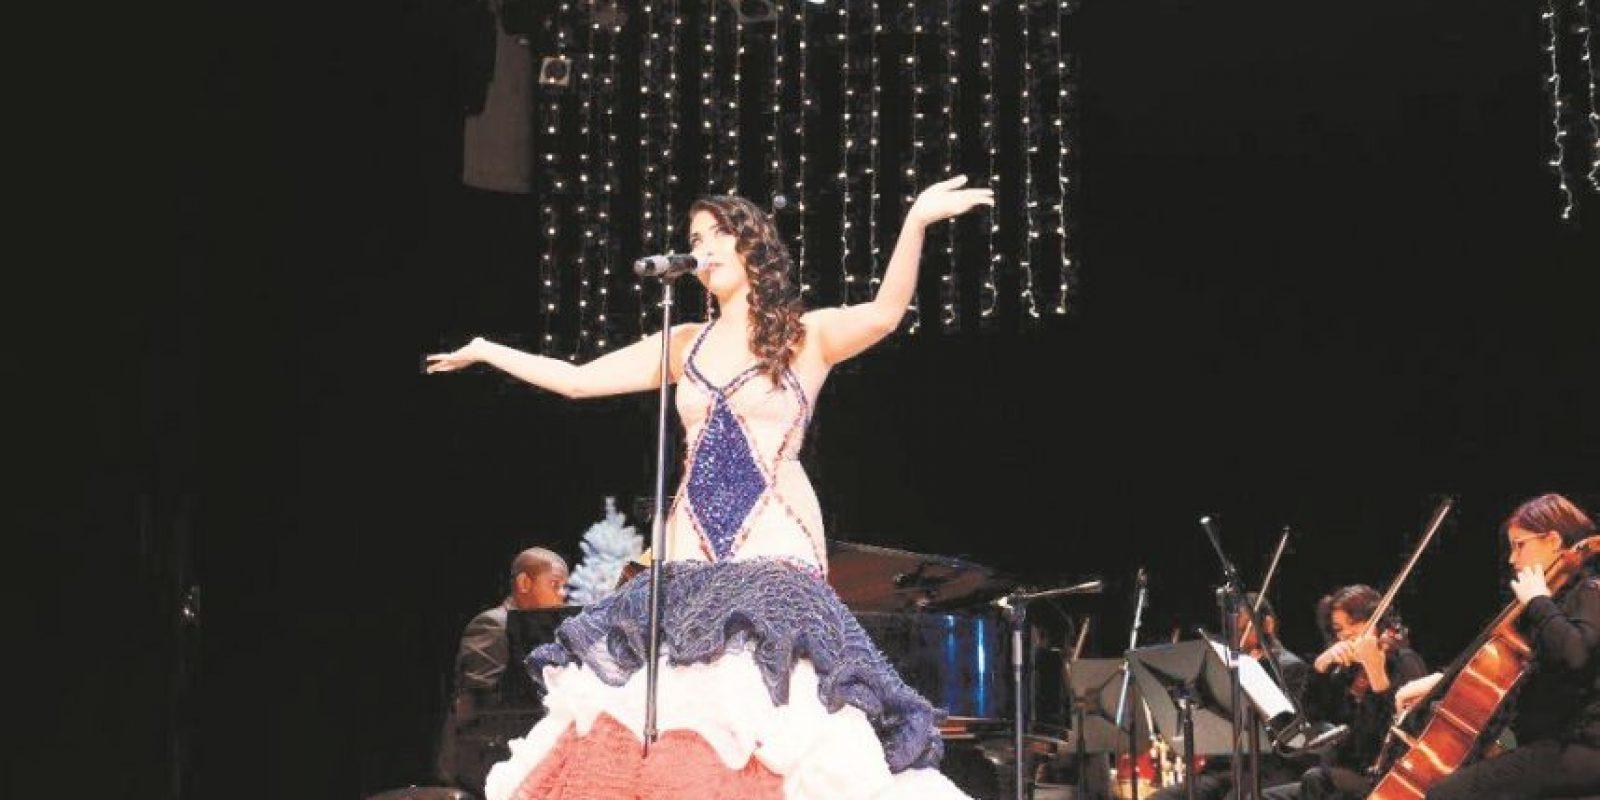 Janette Márquez se dejó seducir por la bachata. Foto:Fuente externa